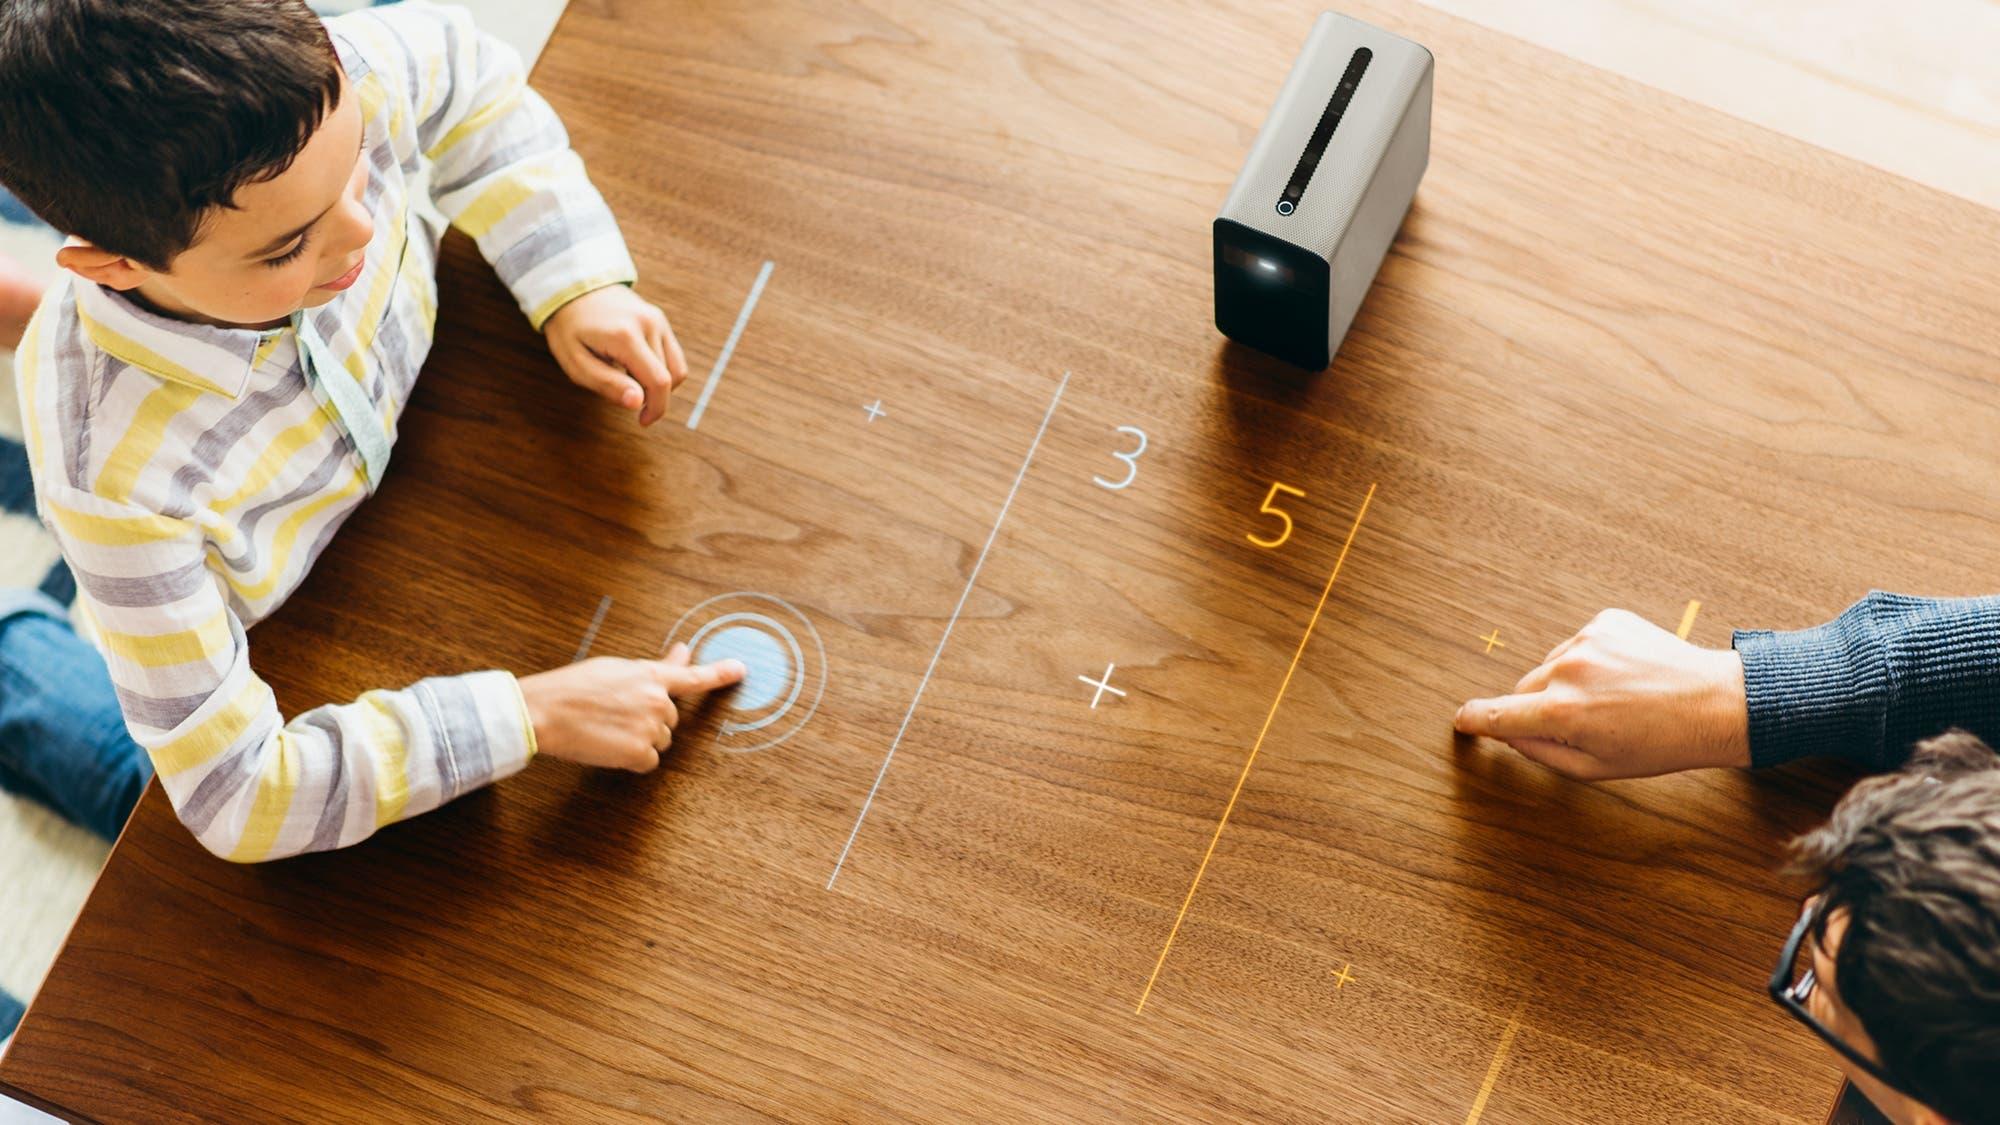 Xperia Touch: Sony presentó un proyector que transforma cualquier pared o mesa en una pantalla táctil